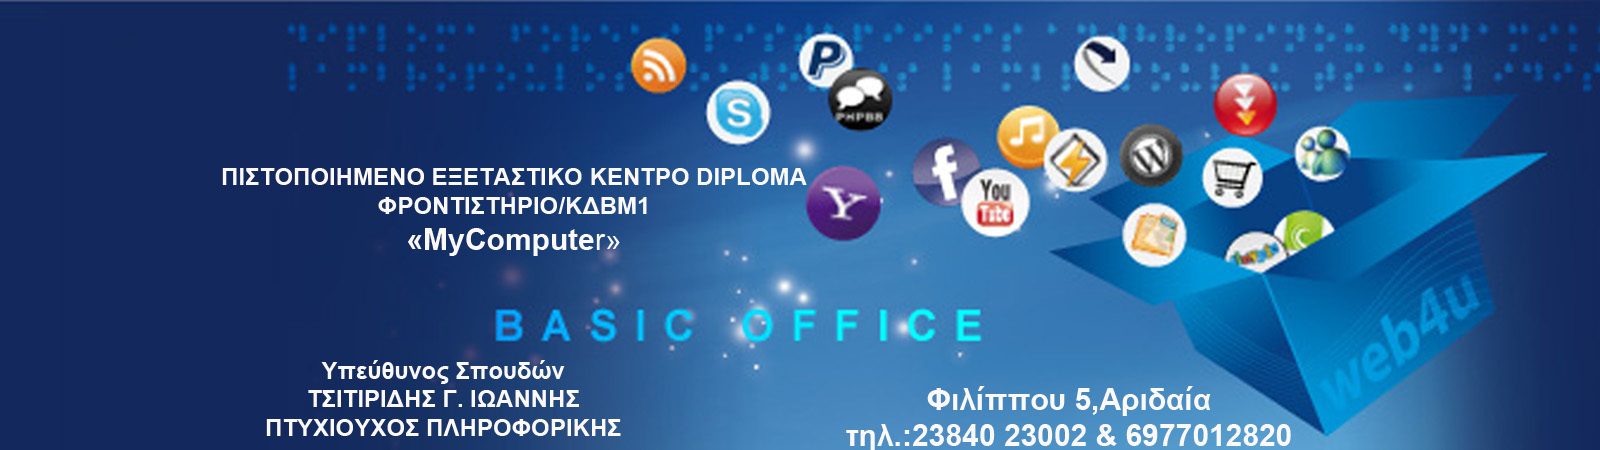 dipoma_mycomputer_aridaia